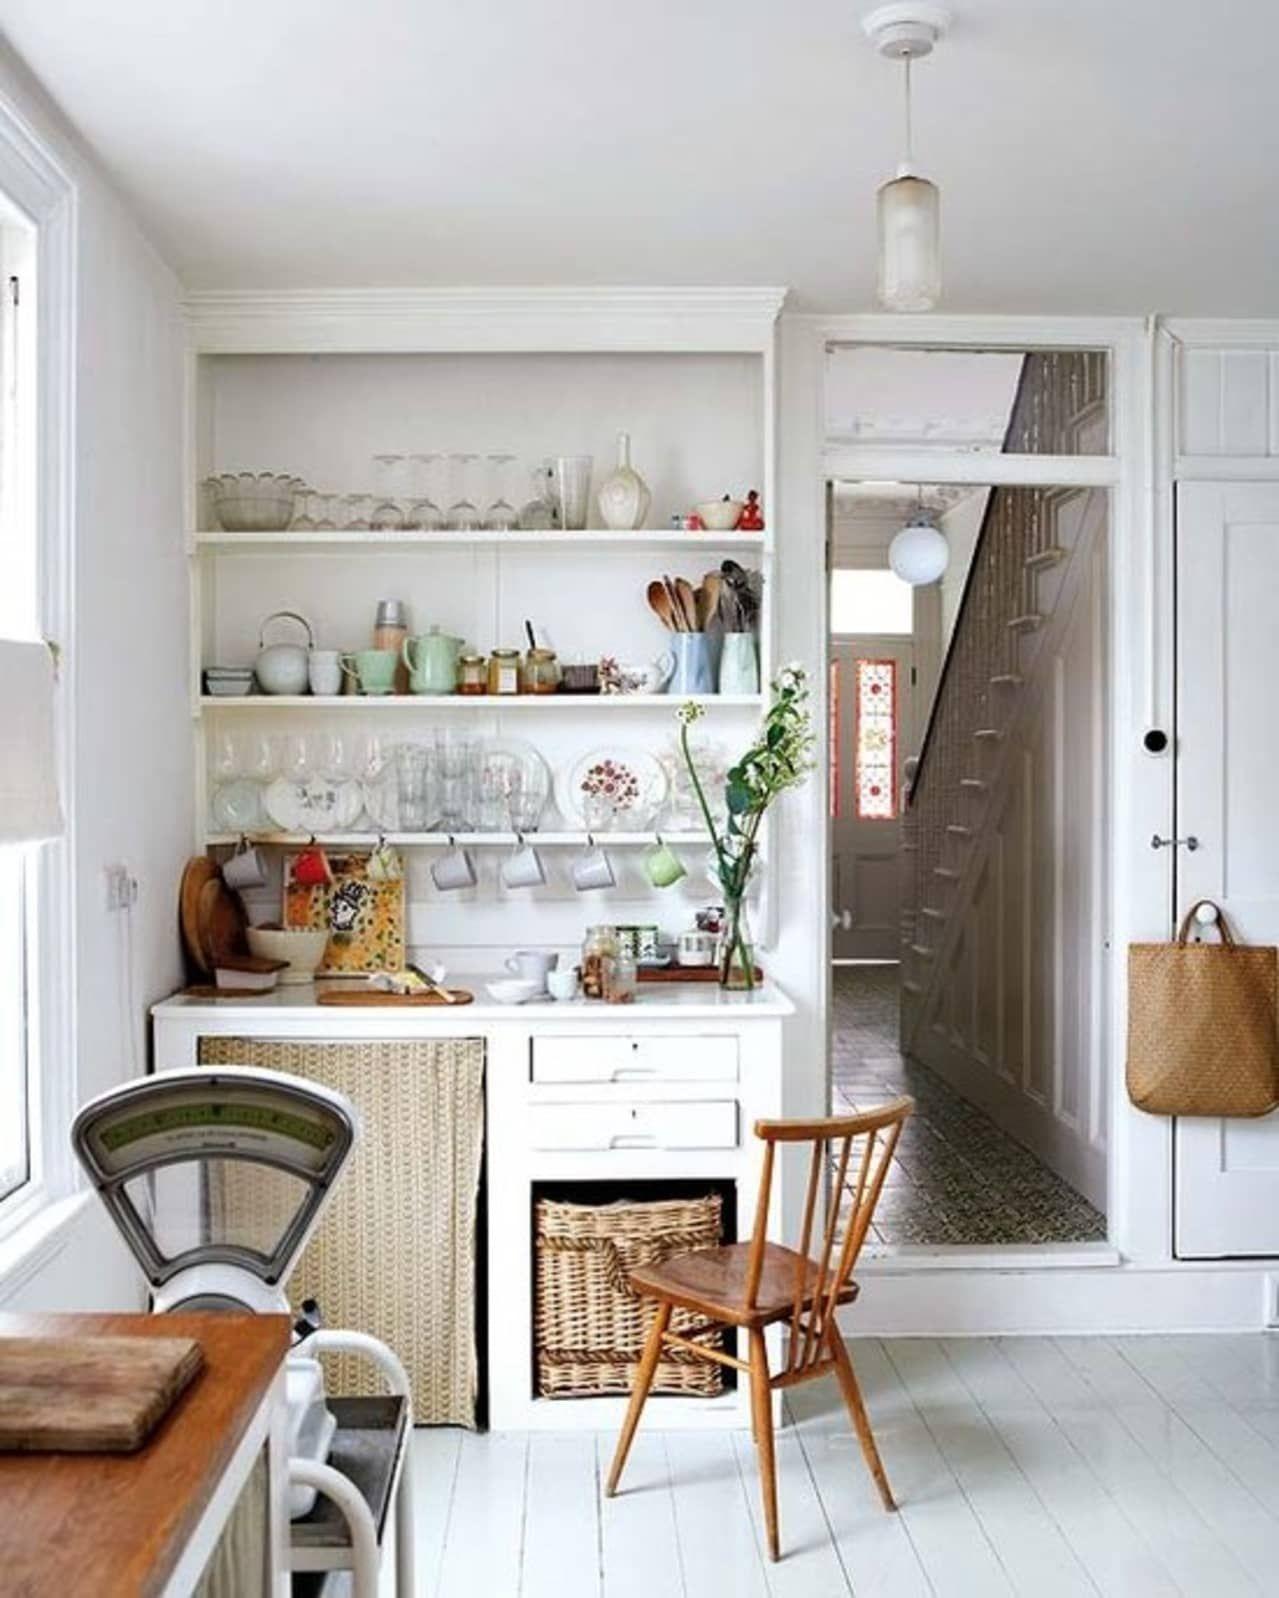 messy cool 15 bohemian kitchens kitchen interior bohemian kitchen interior design kitchen on kitchen interior boho id=56545